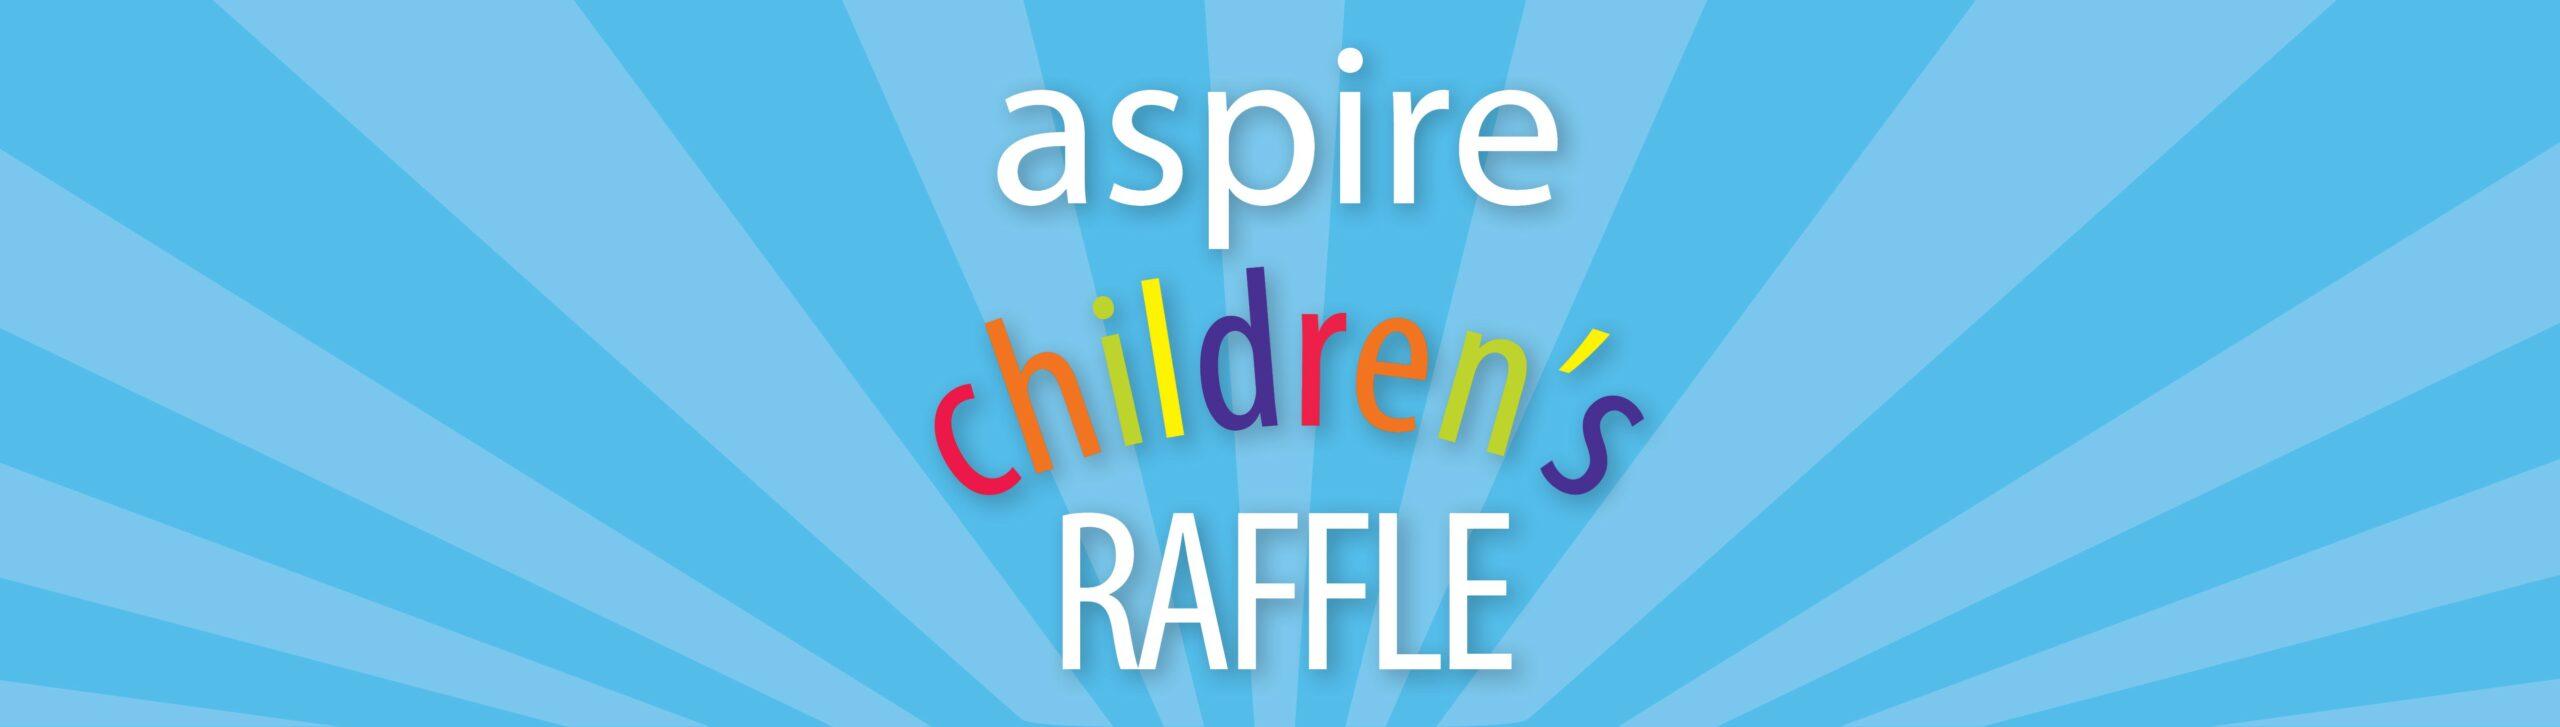 Aspire Children's Raffle